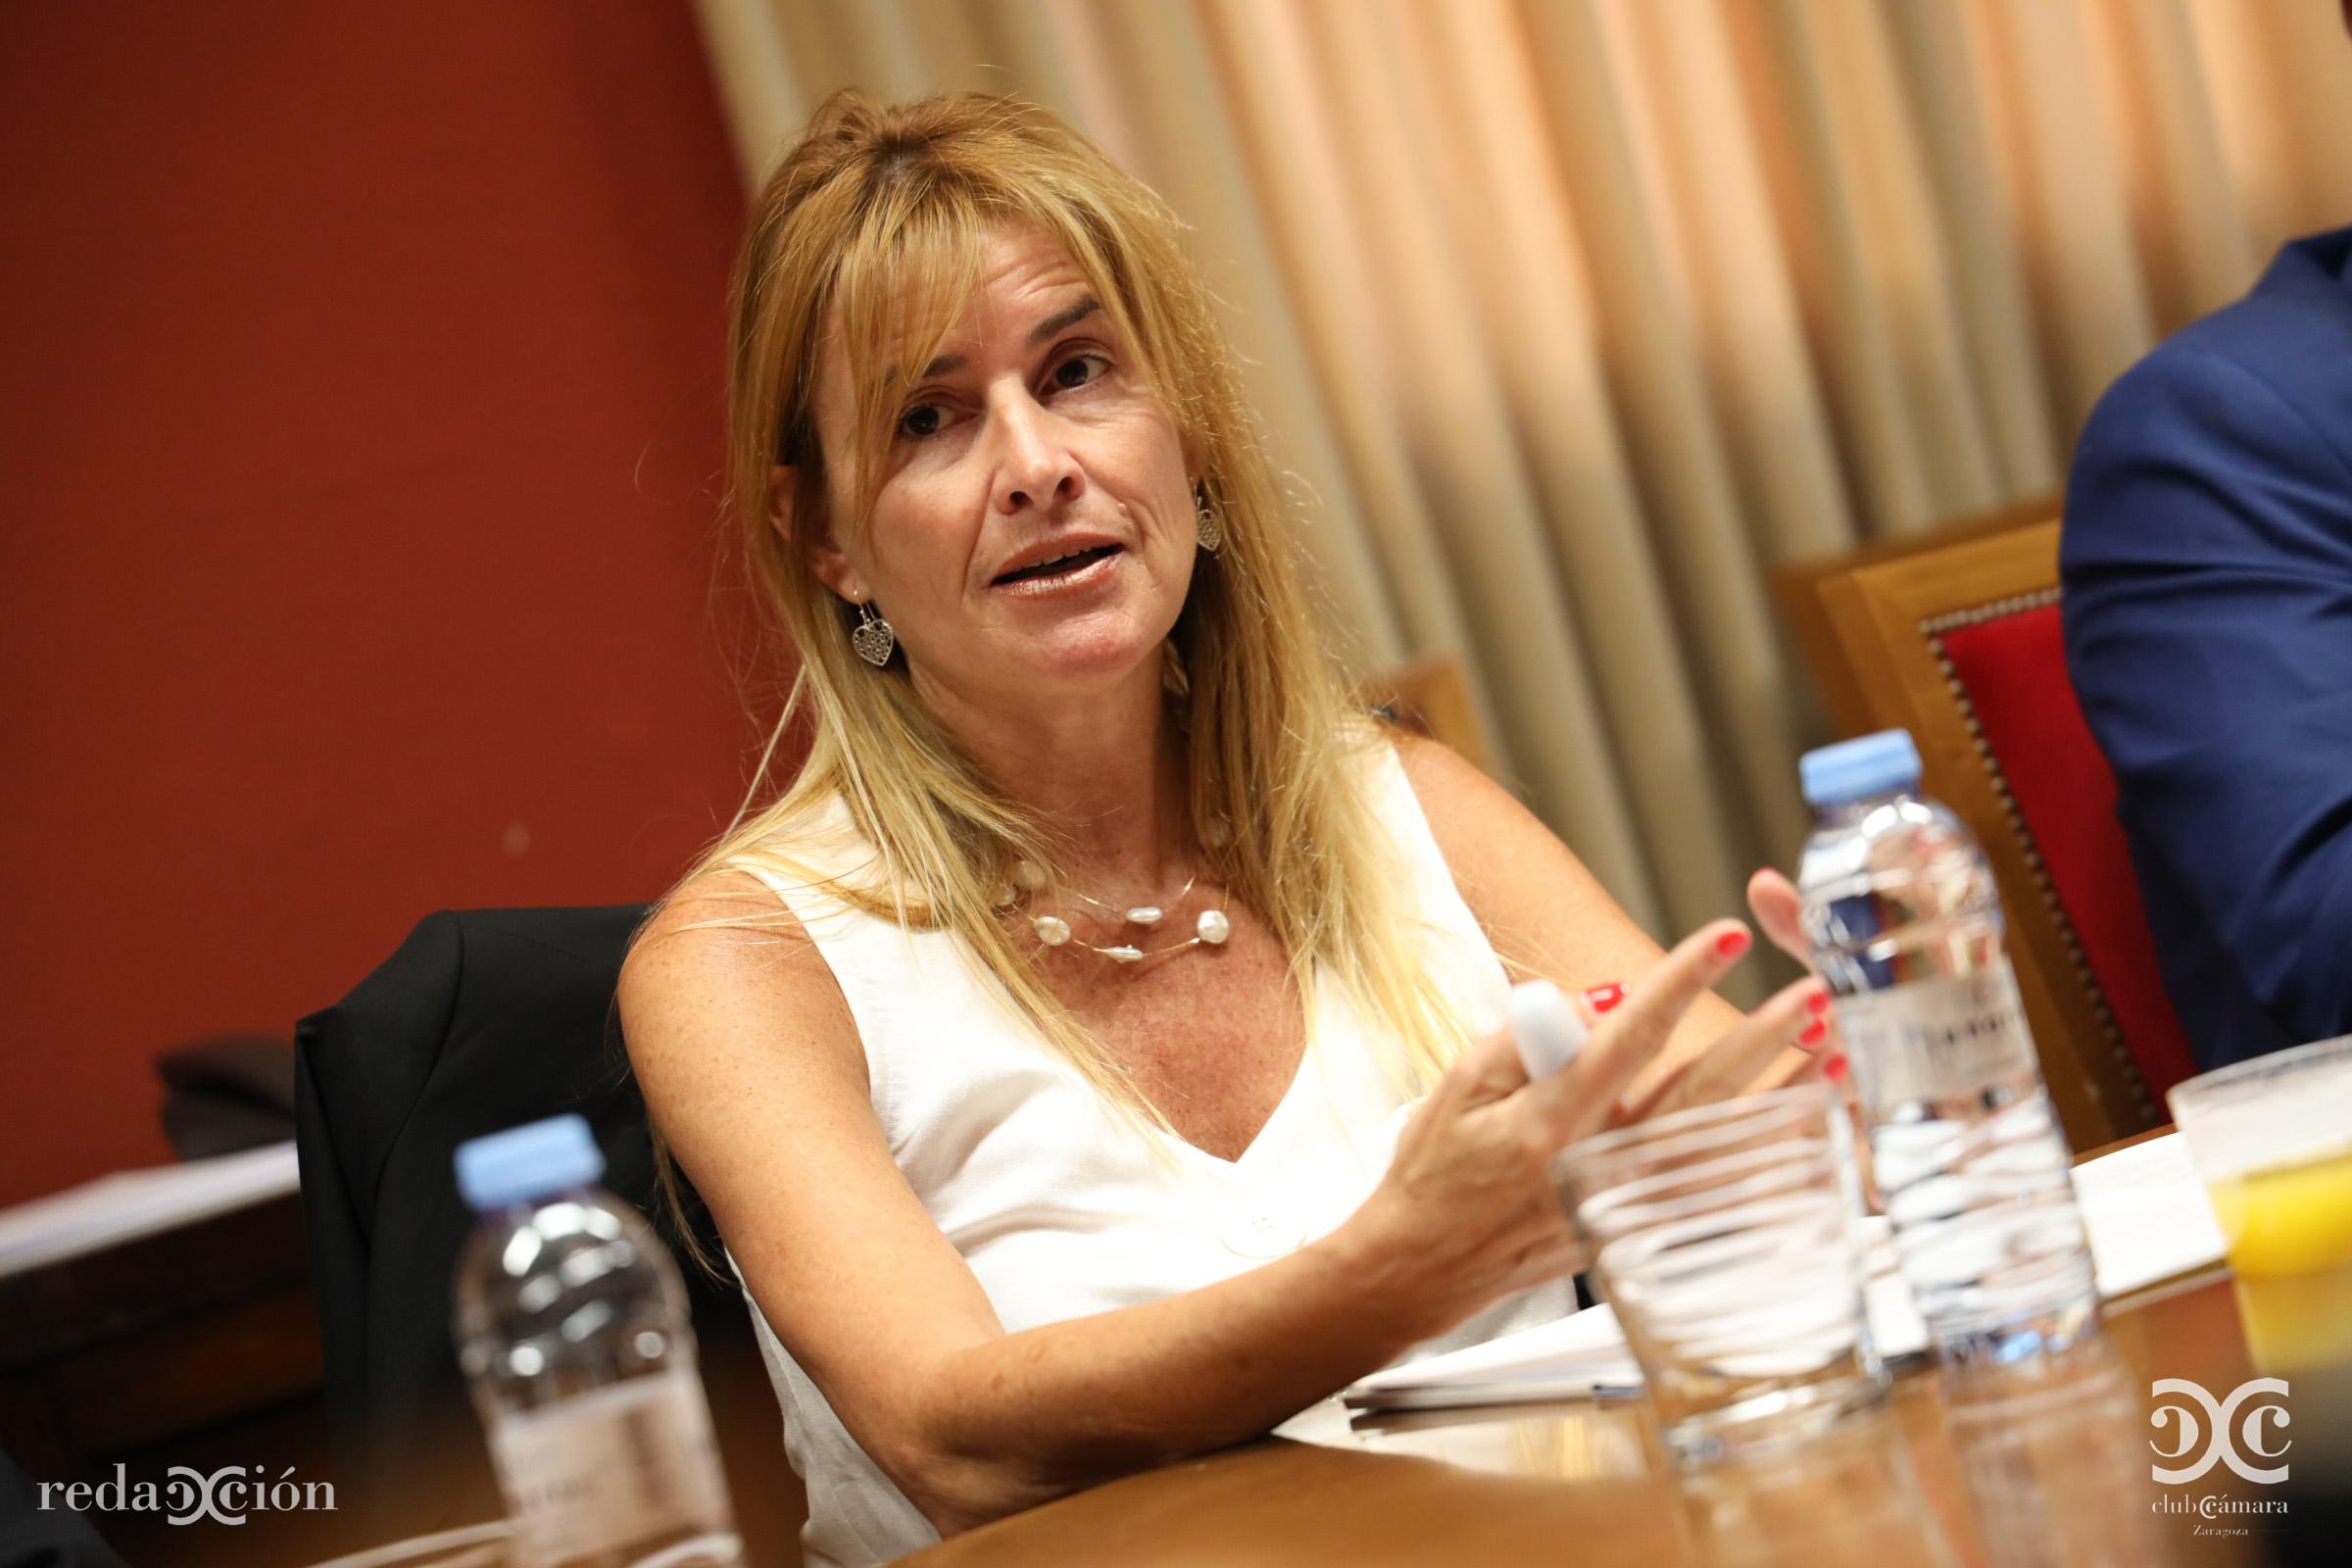 María Pilar Oliveros, Fersa